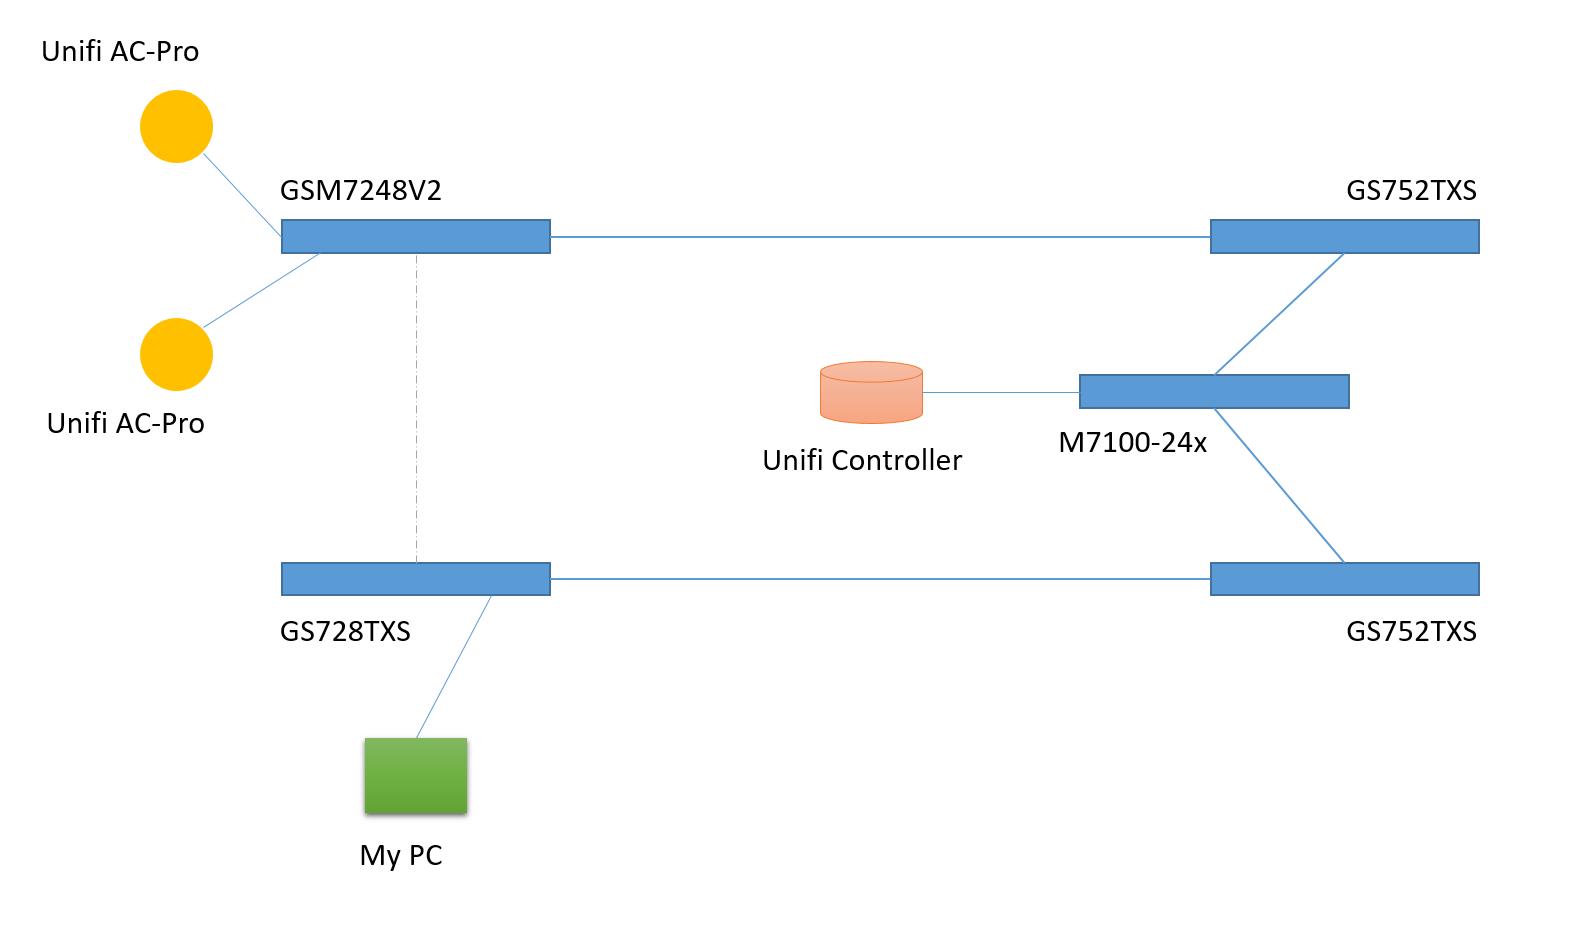 Solved: STP Leak using Broadcast packet 01:80:c2:00:00:1c